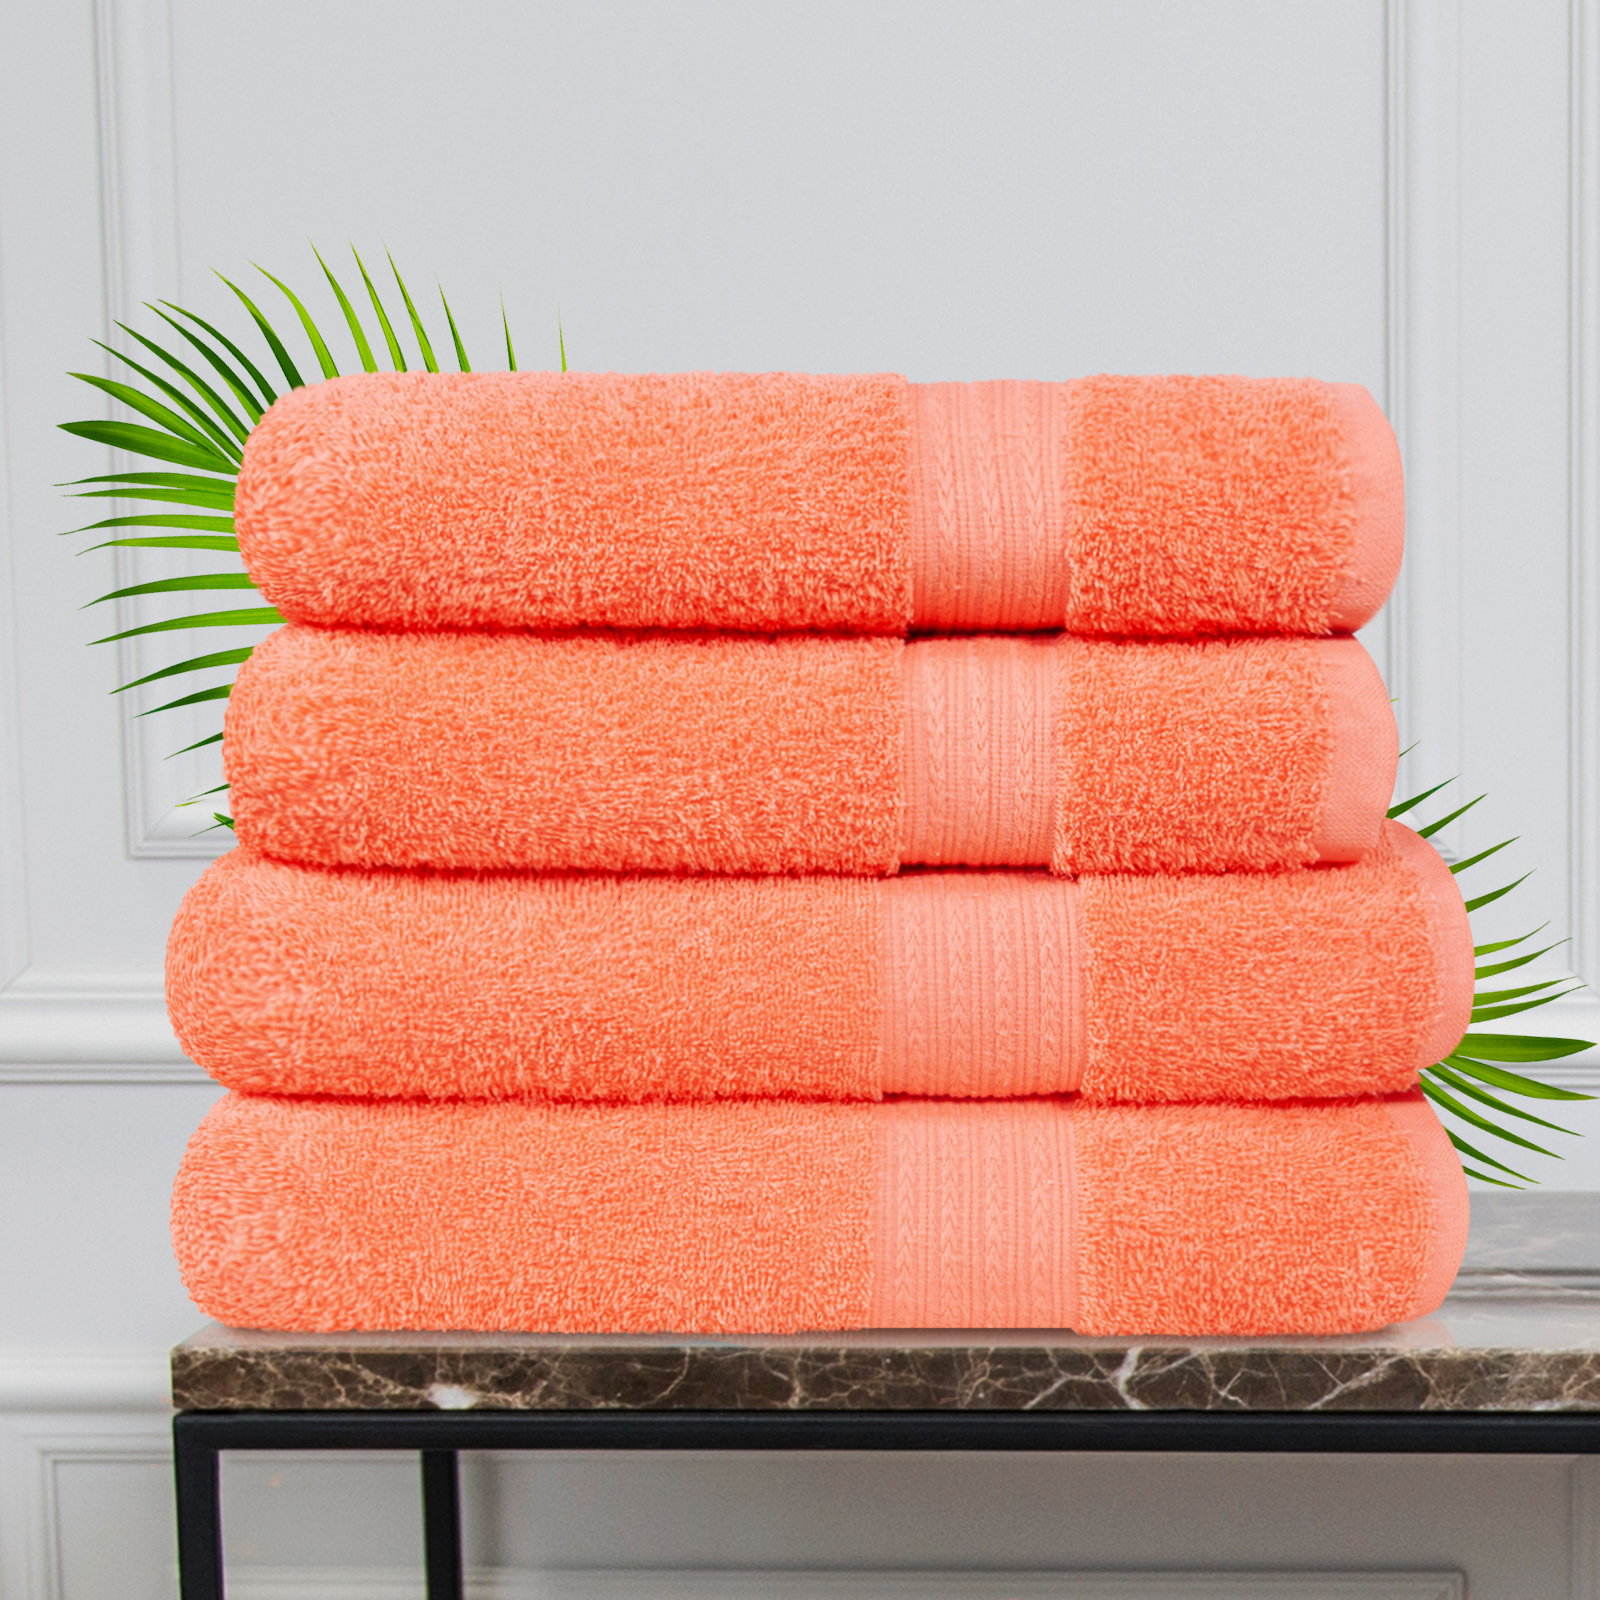 Набор из 4 полотенец Morocco Цвет: Коралловый (50х90 см - 2 шт, 70х140 см - 2 шт)